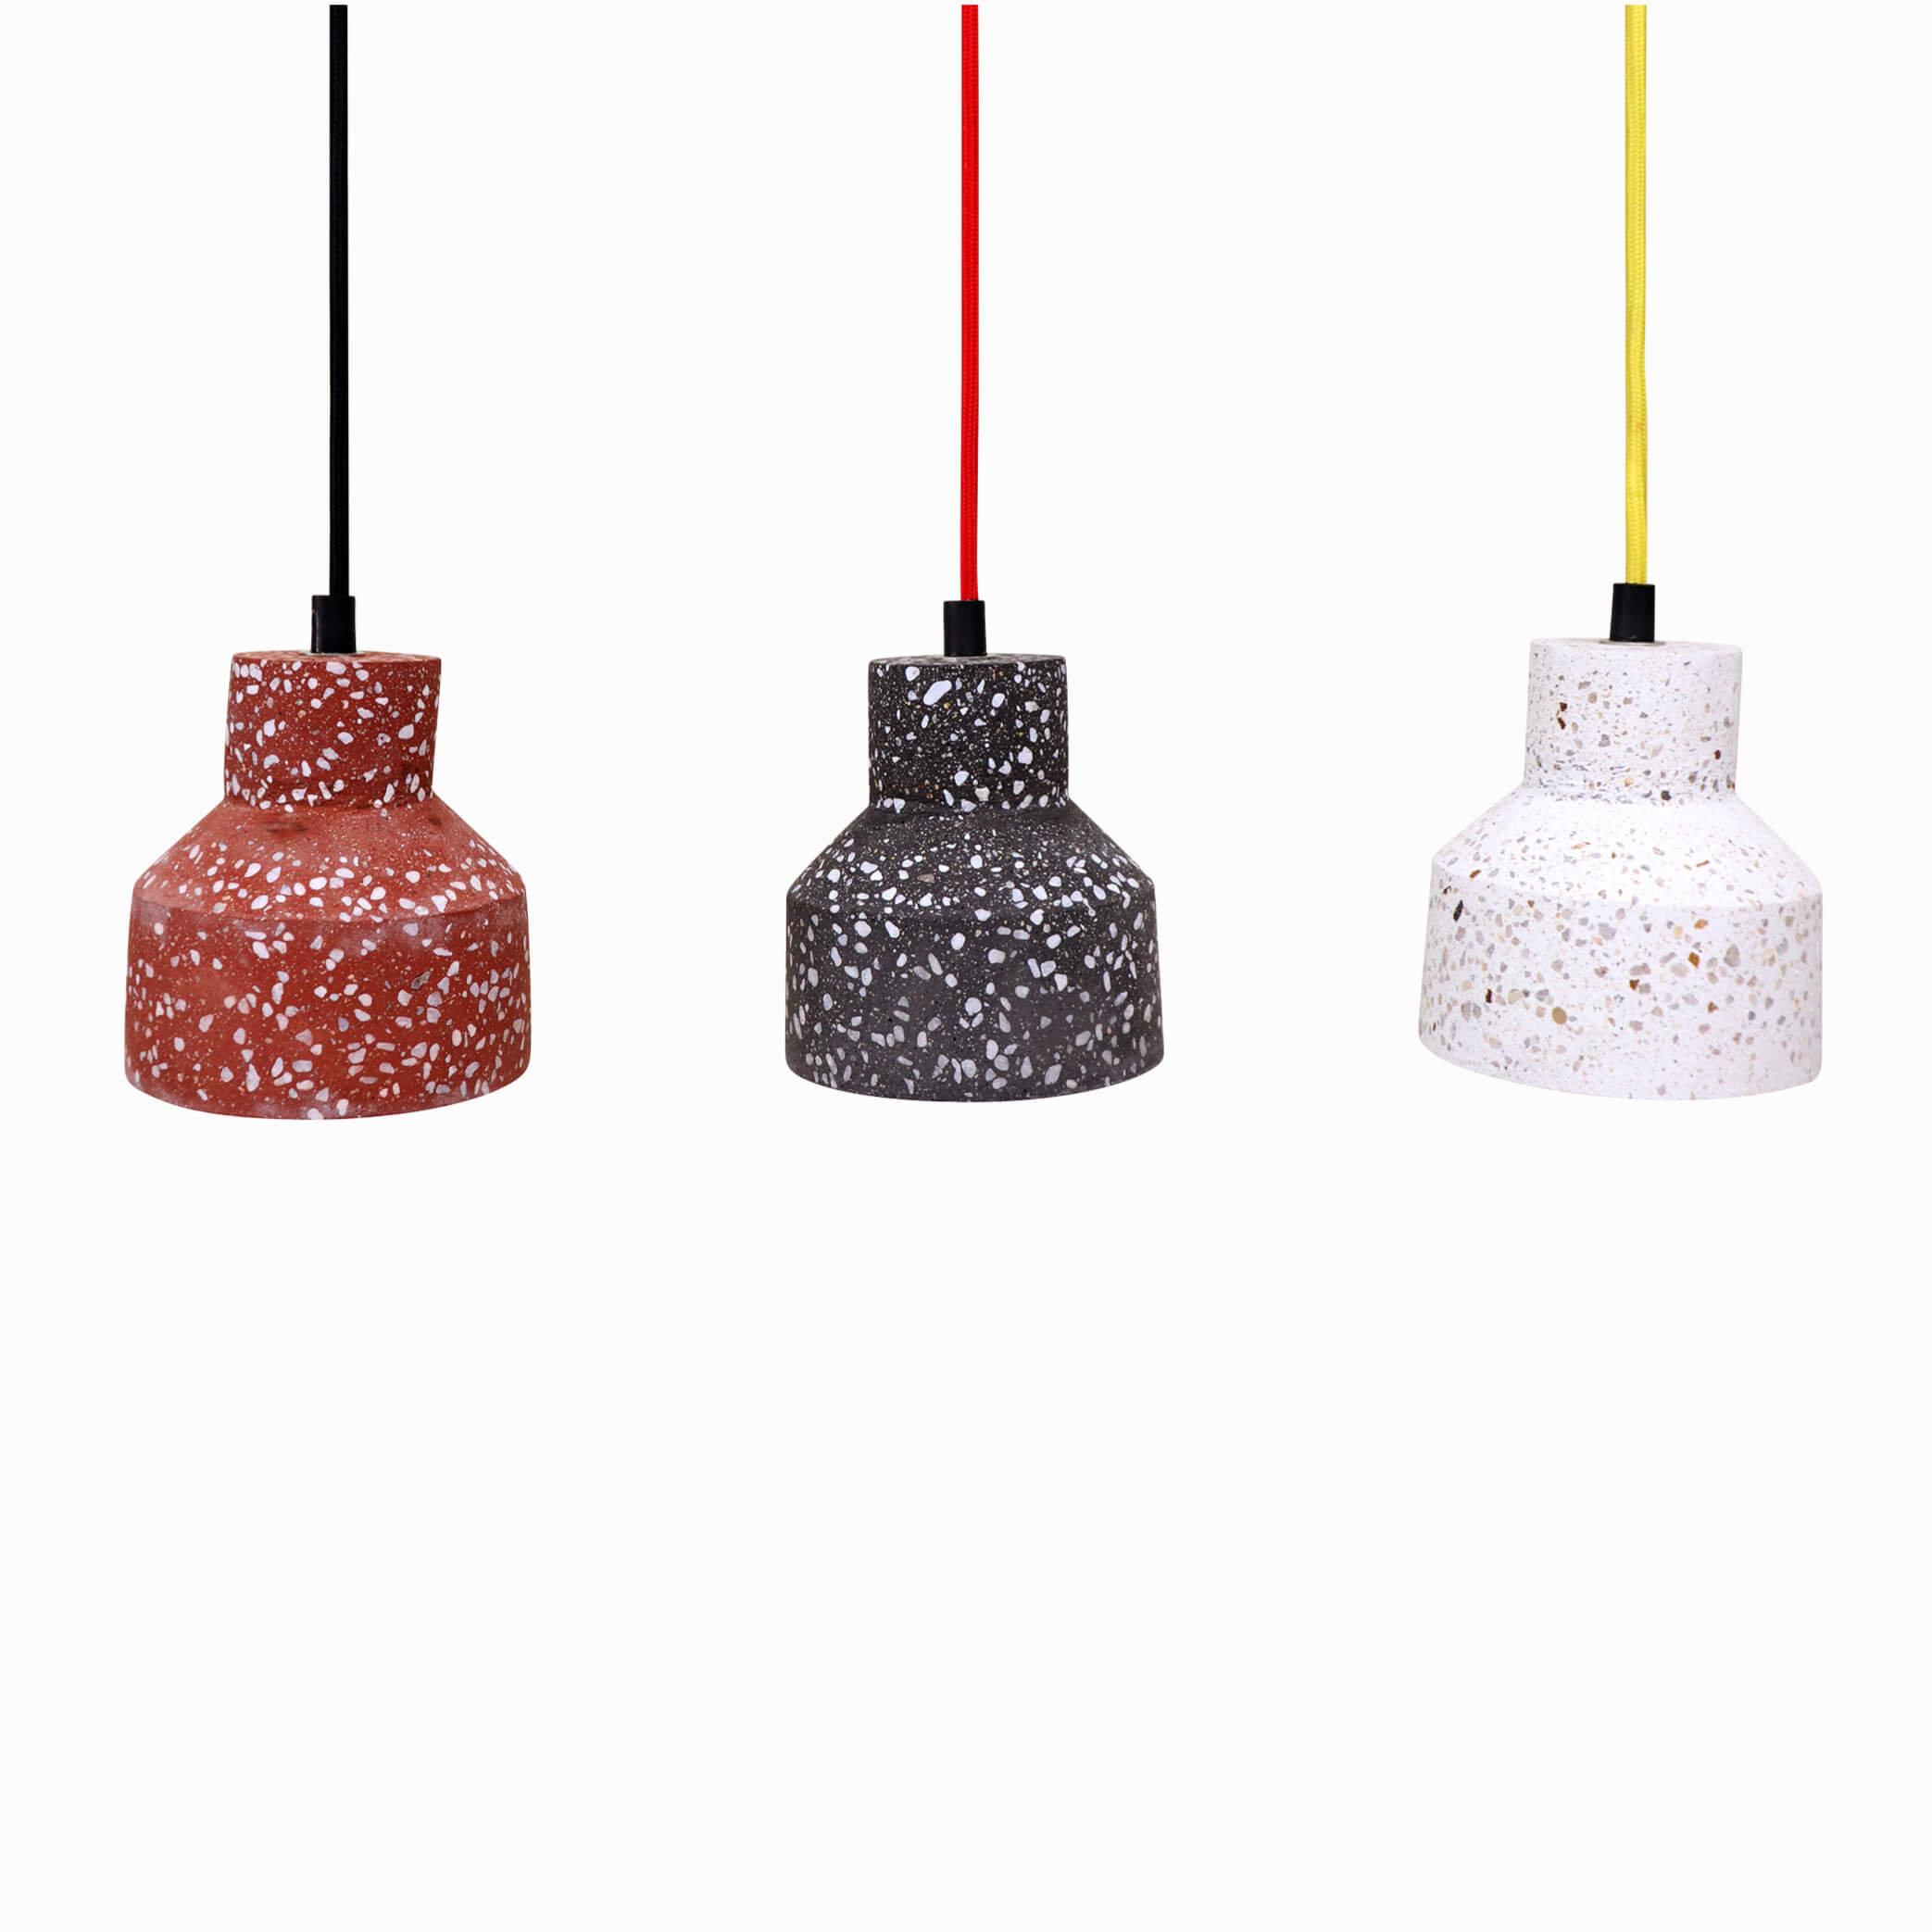 Pendant Light – Ceiling Light Fixture   Kitchen & Dining Lighting   Hanging Lamp   Modern Lighting   (red, Black And White Terrazzo) Inside Kraker 1 Light Single Cylinder Pendants (View 21 of 30)